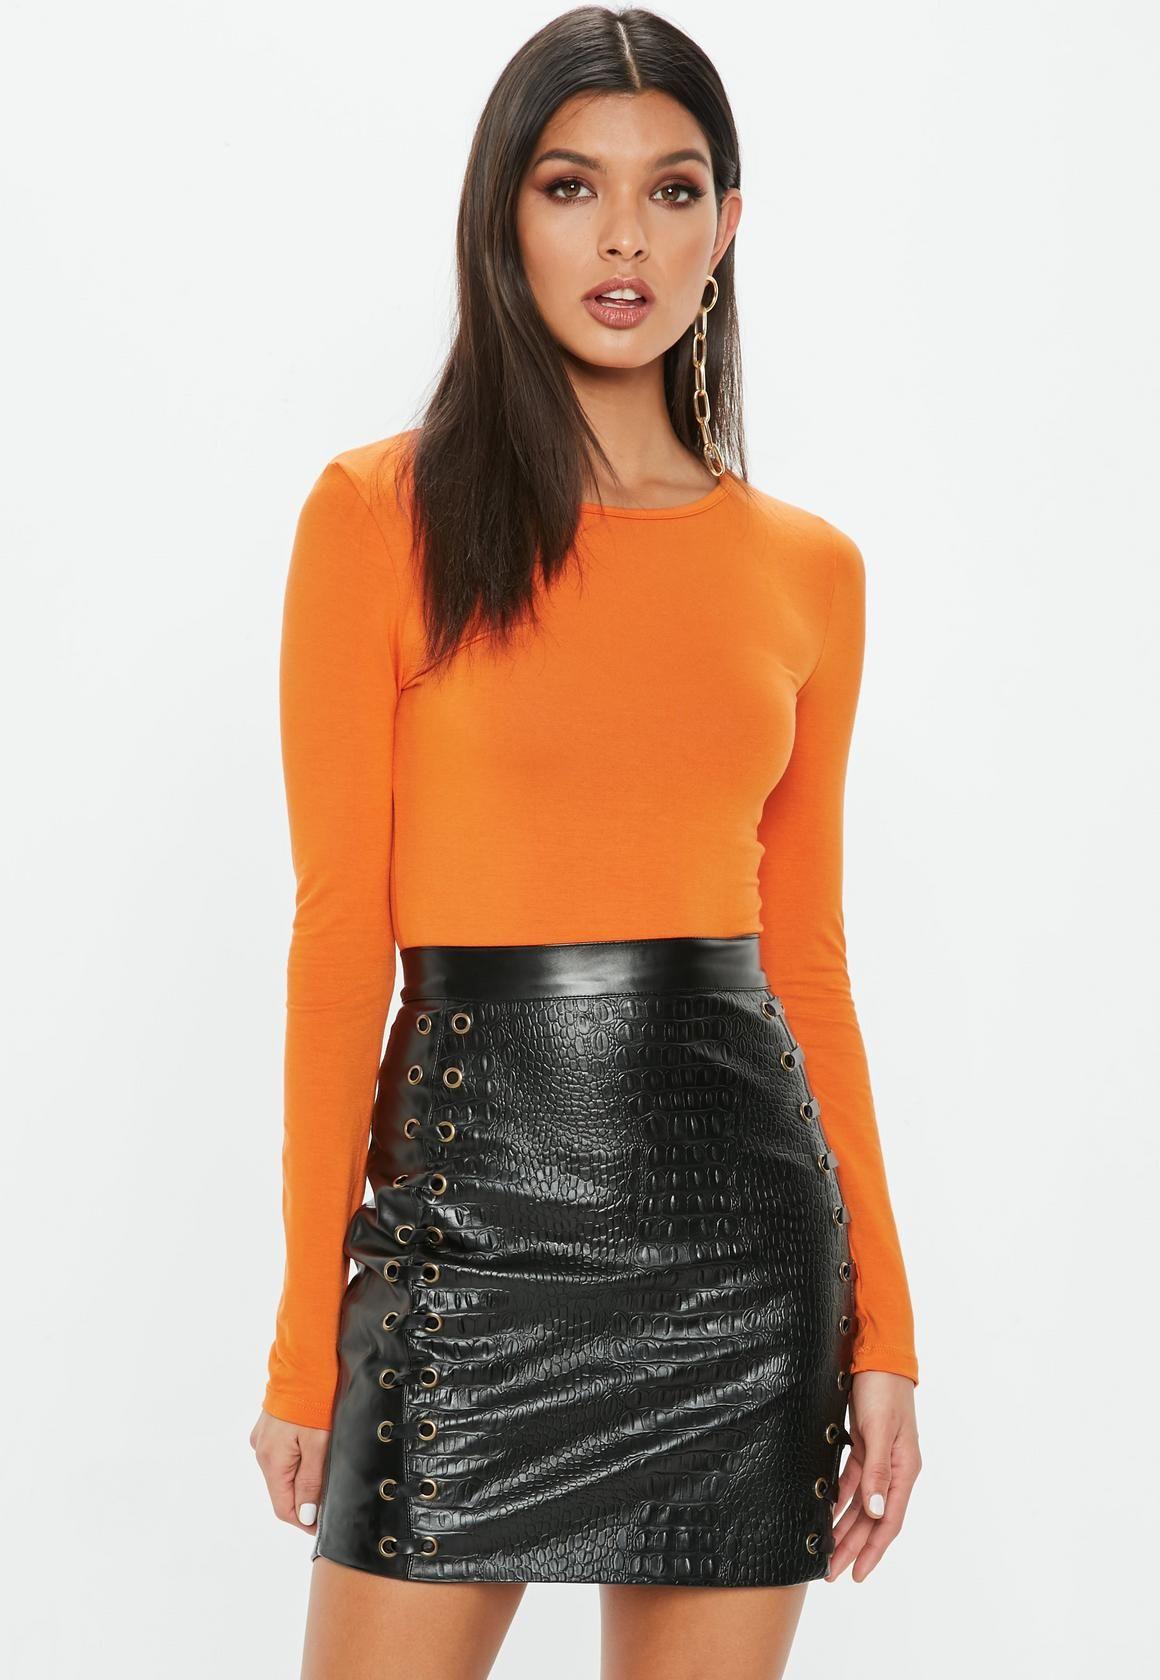 ec19e99c360 Missguided - Orange Crew Neck Long Sleeve Bodysuit Cami Crop Top, Long  Sleeve Bodysuit,